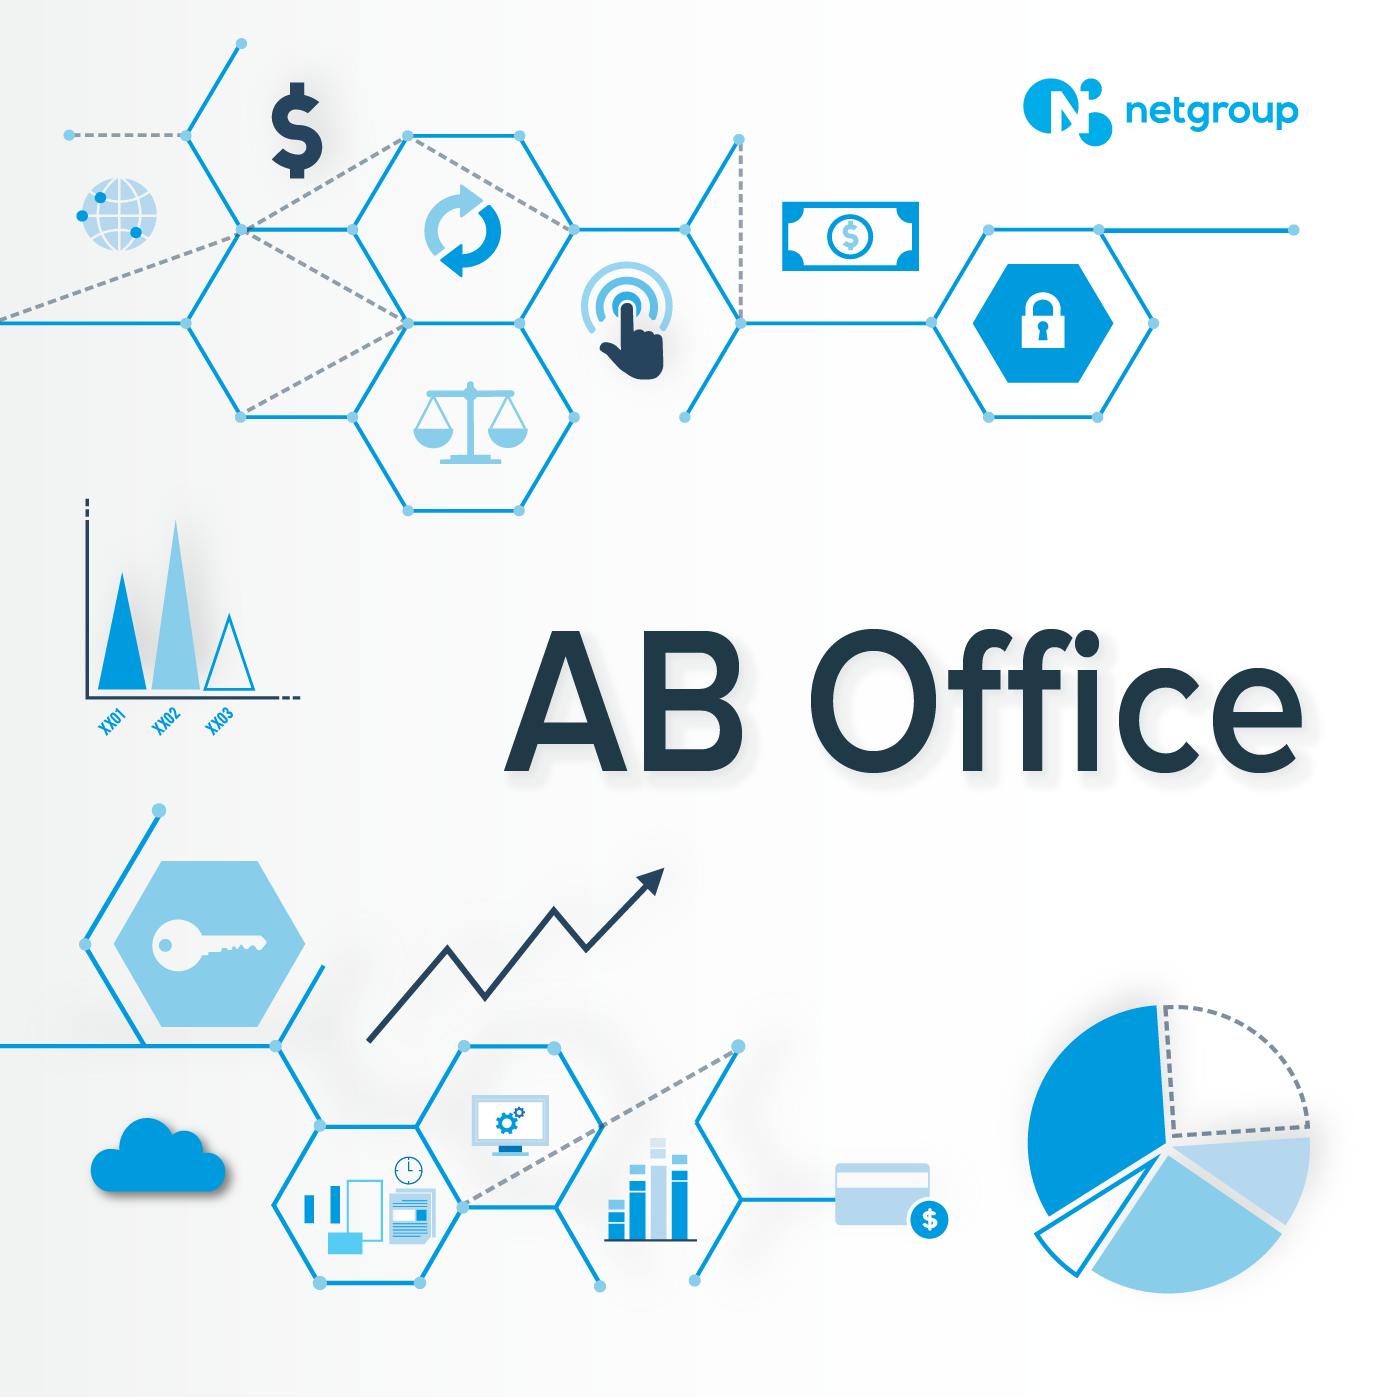 AB Office